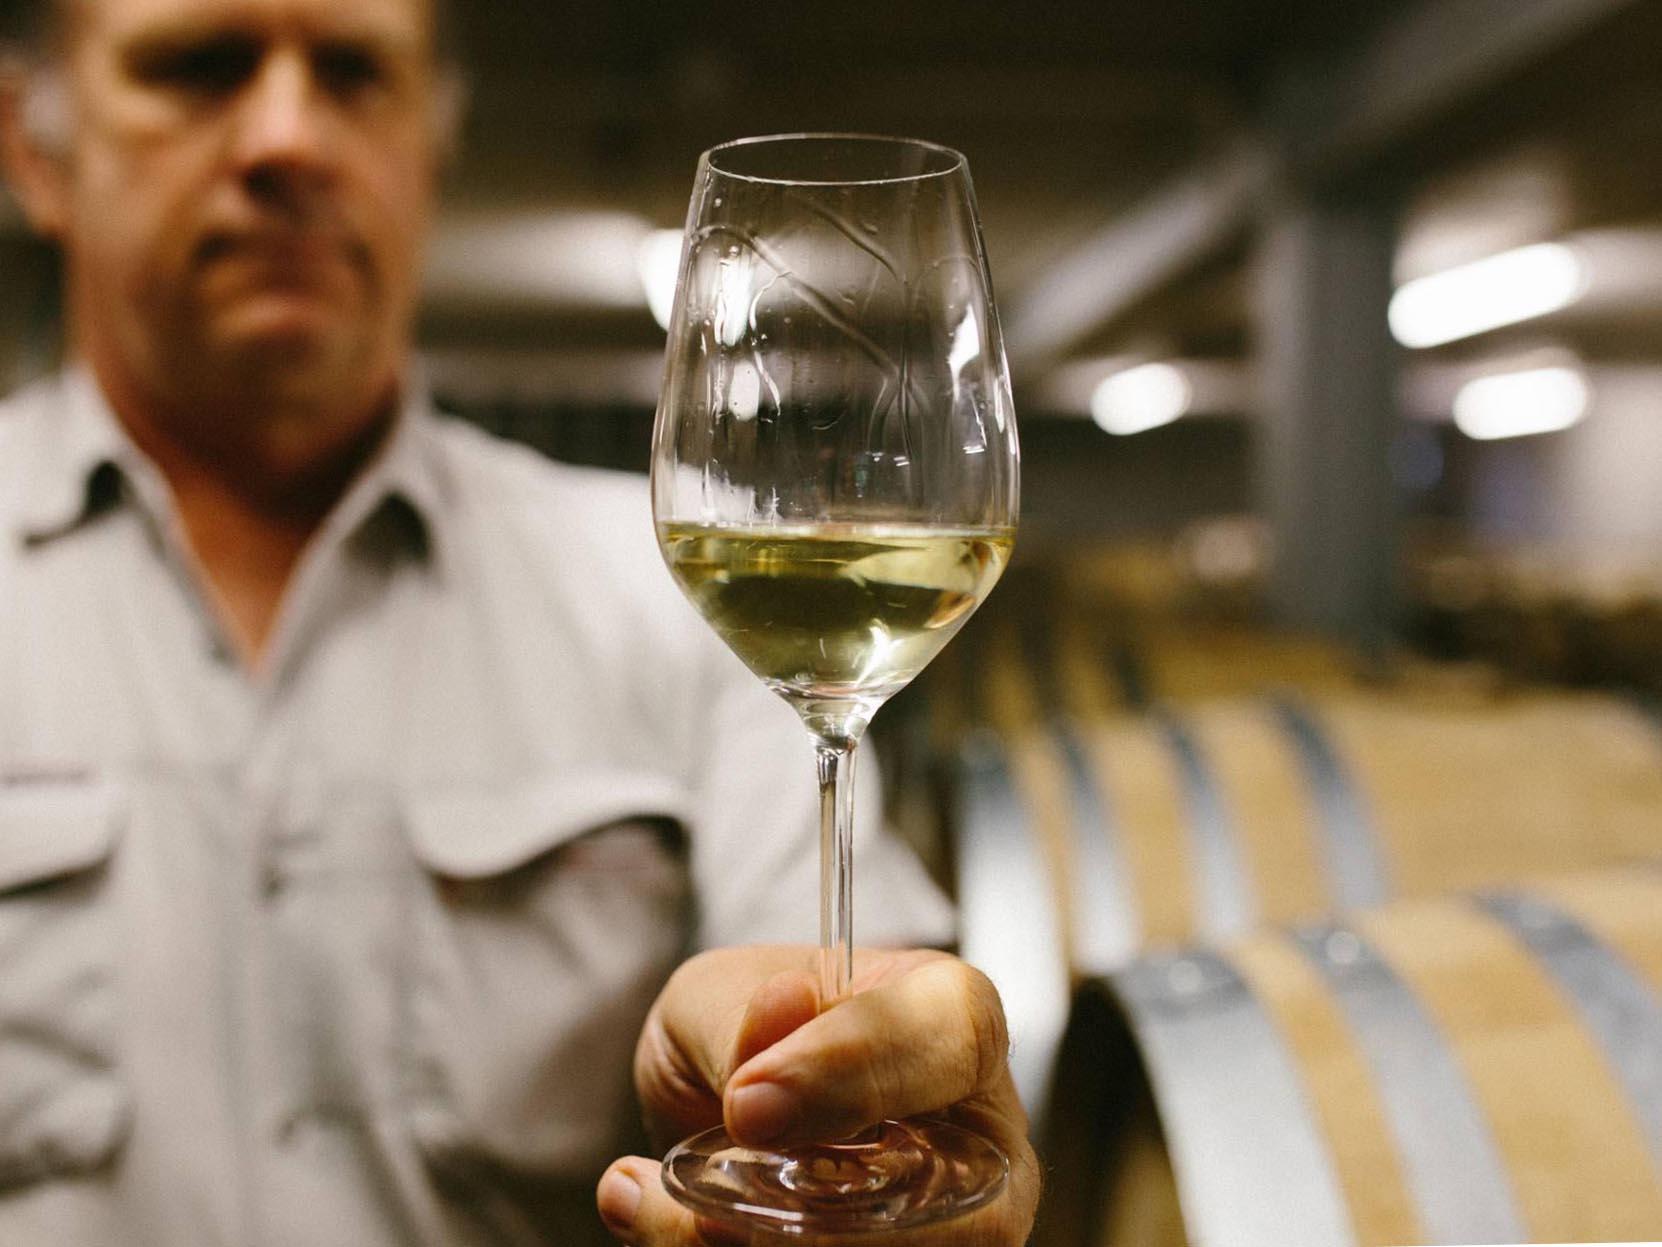 nz-mbrajkovich-master-of-wine